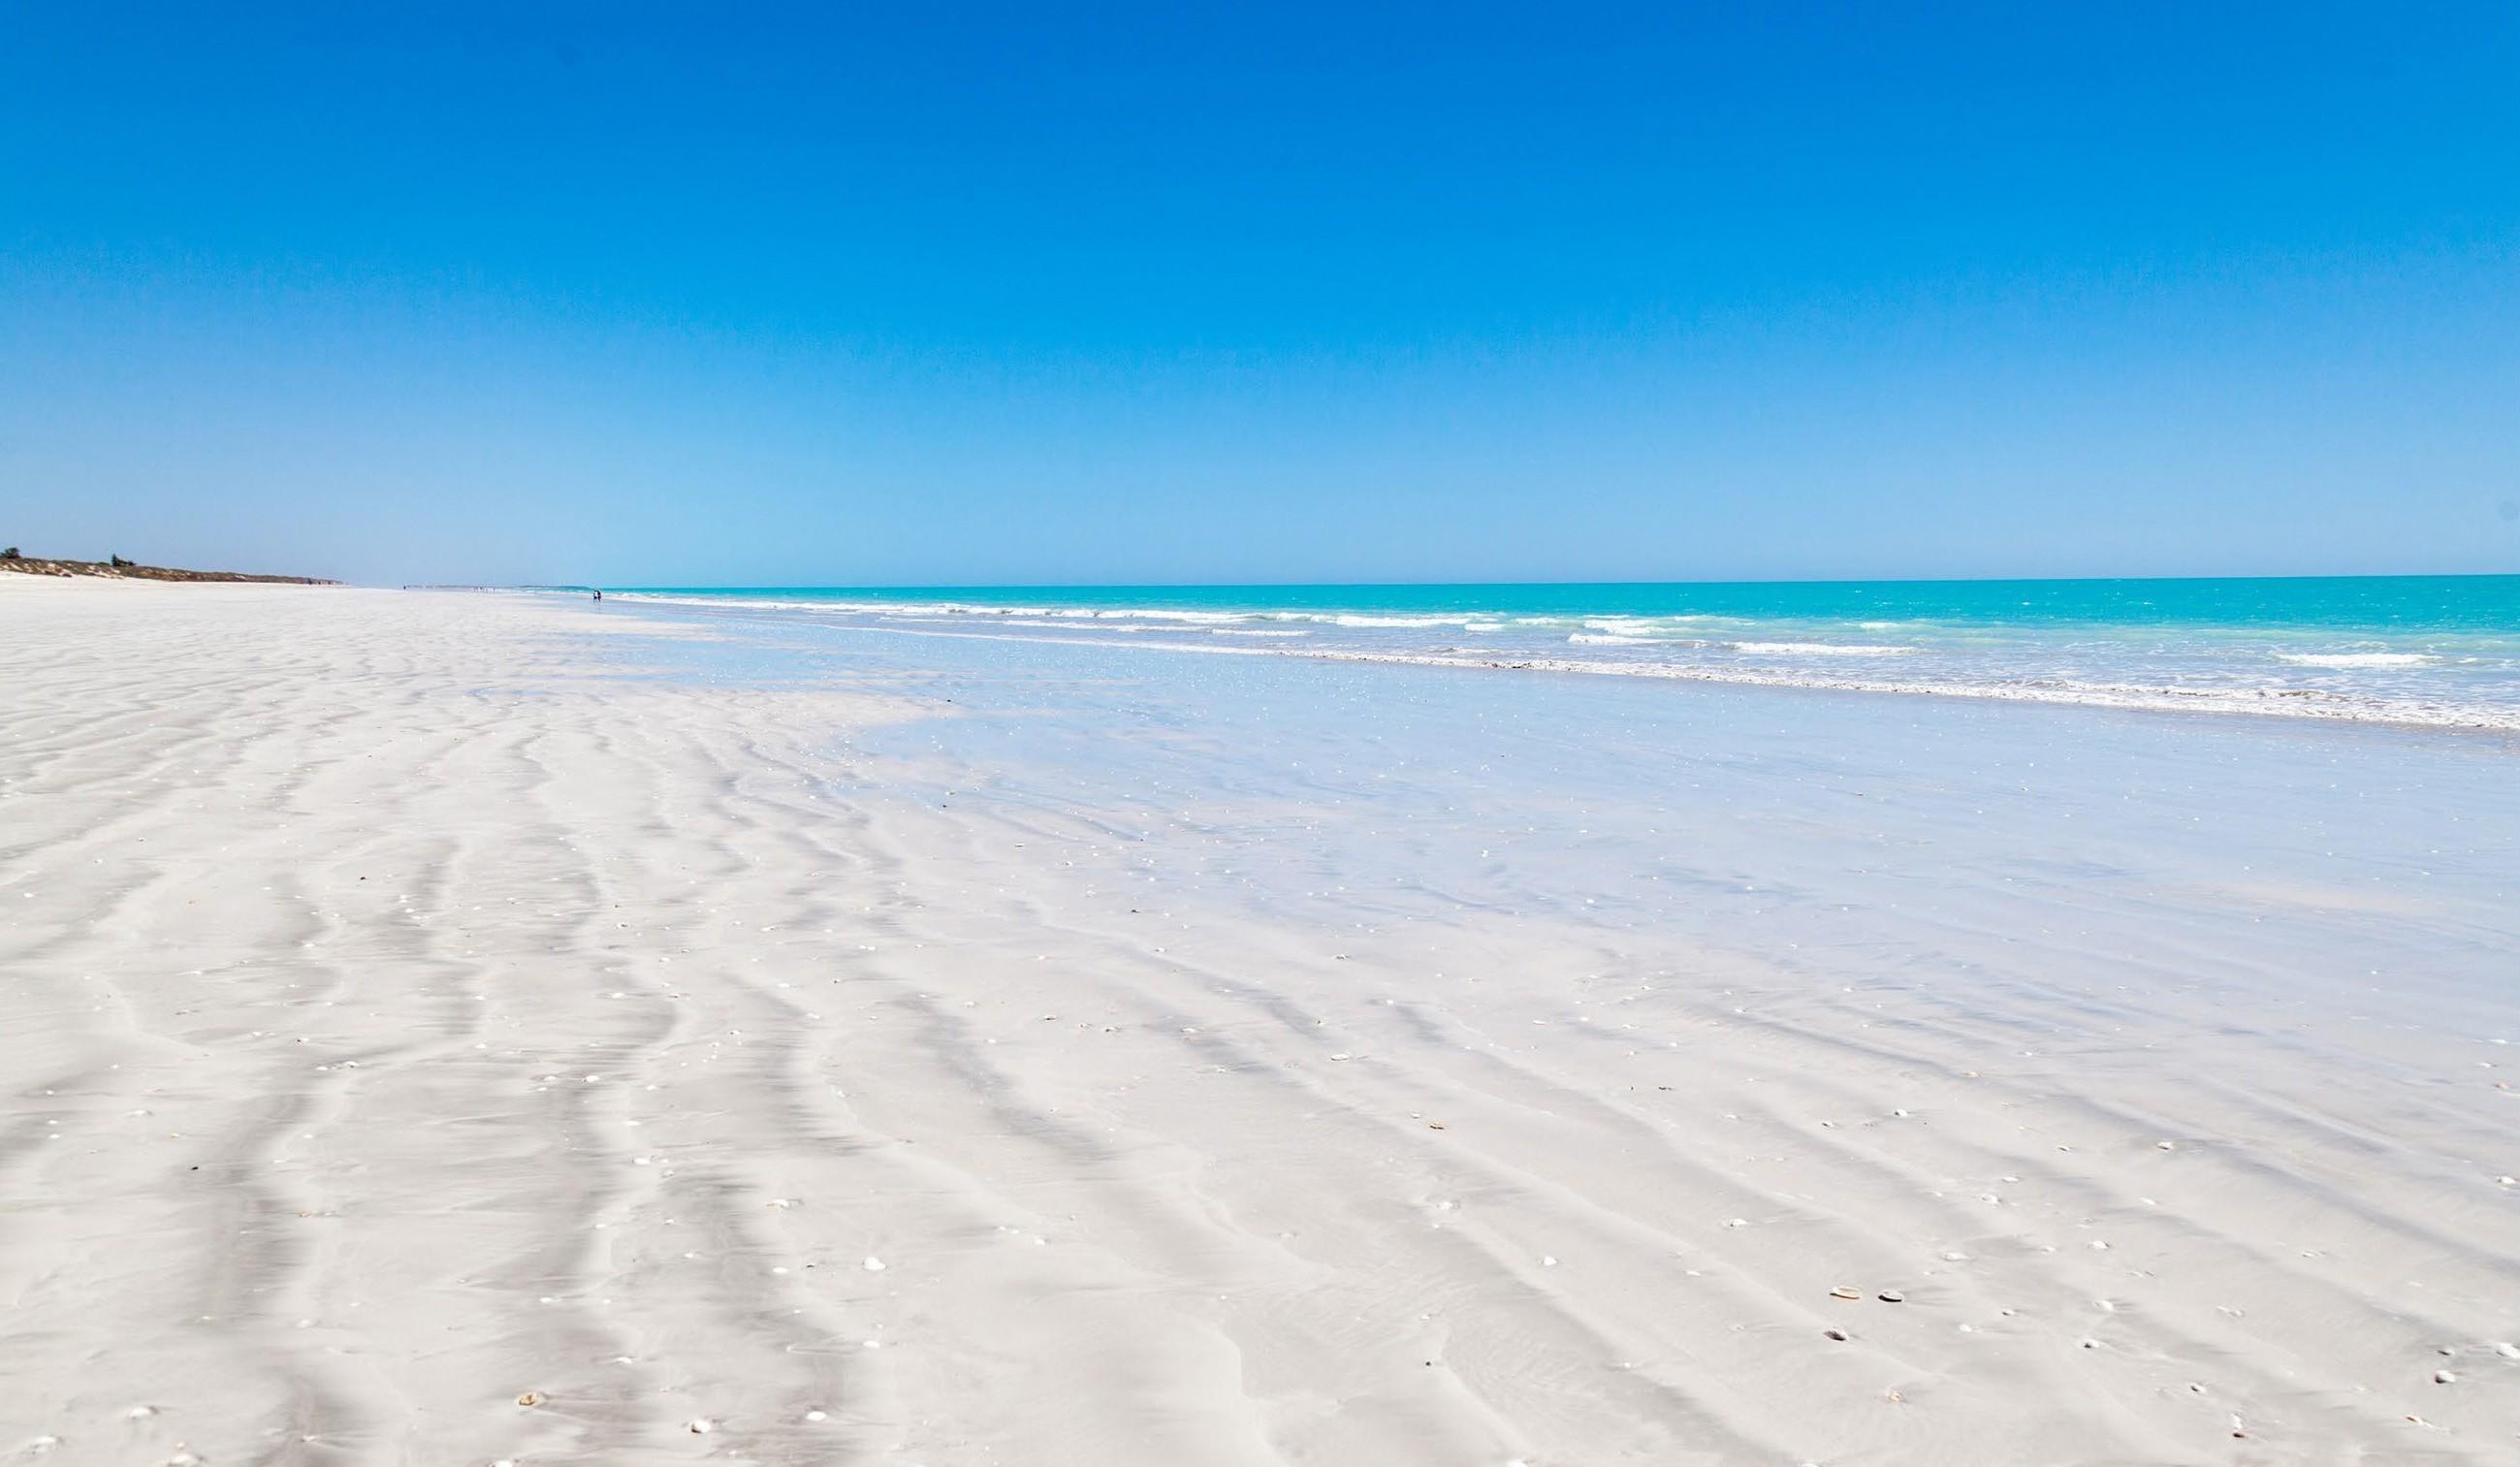 The North coast of Egypt - مجموعه های توریستی